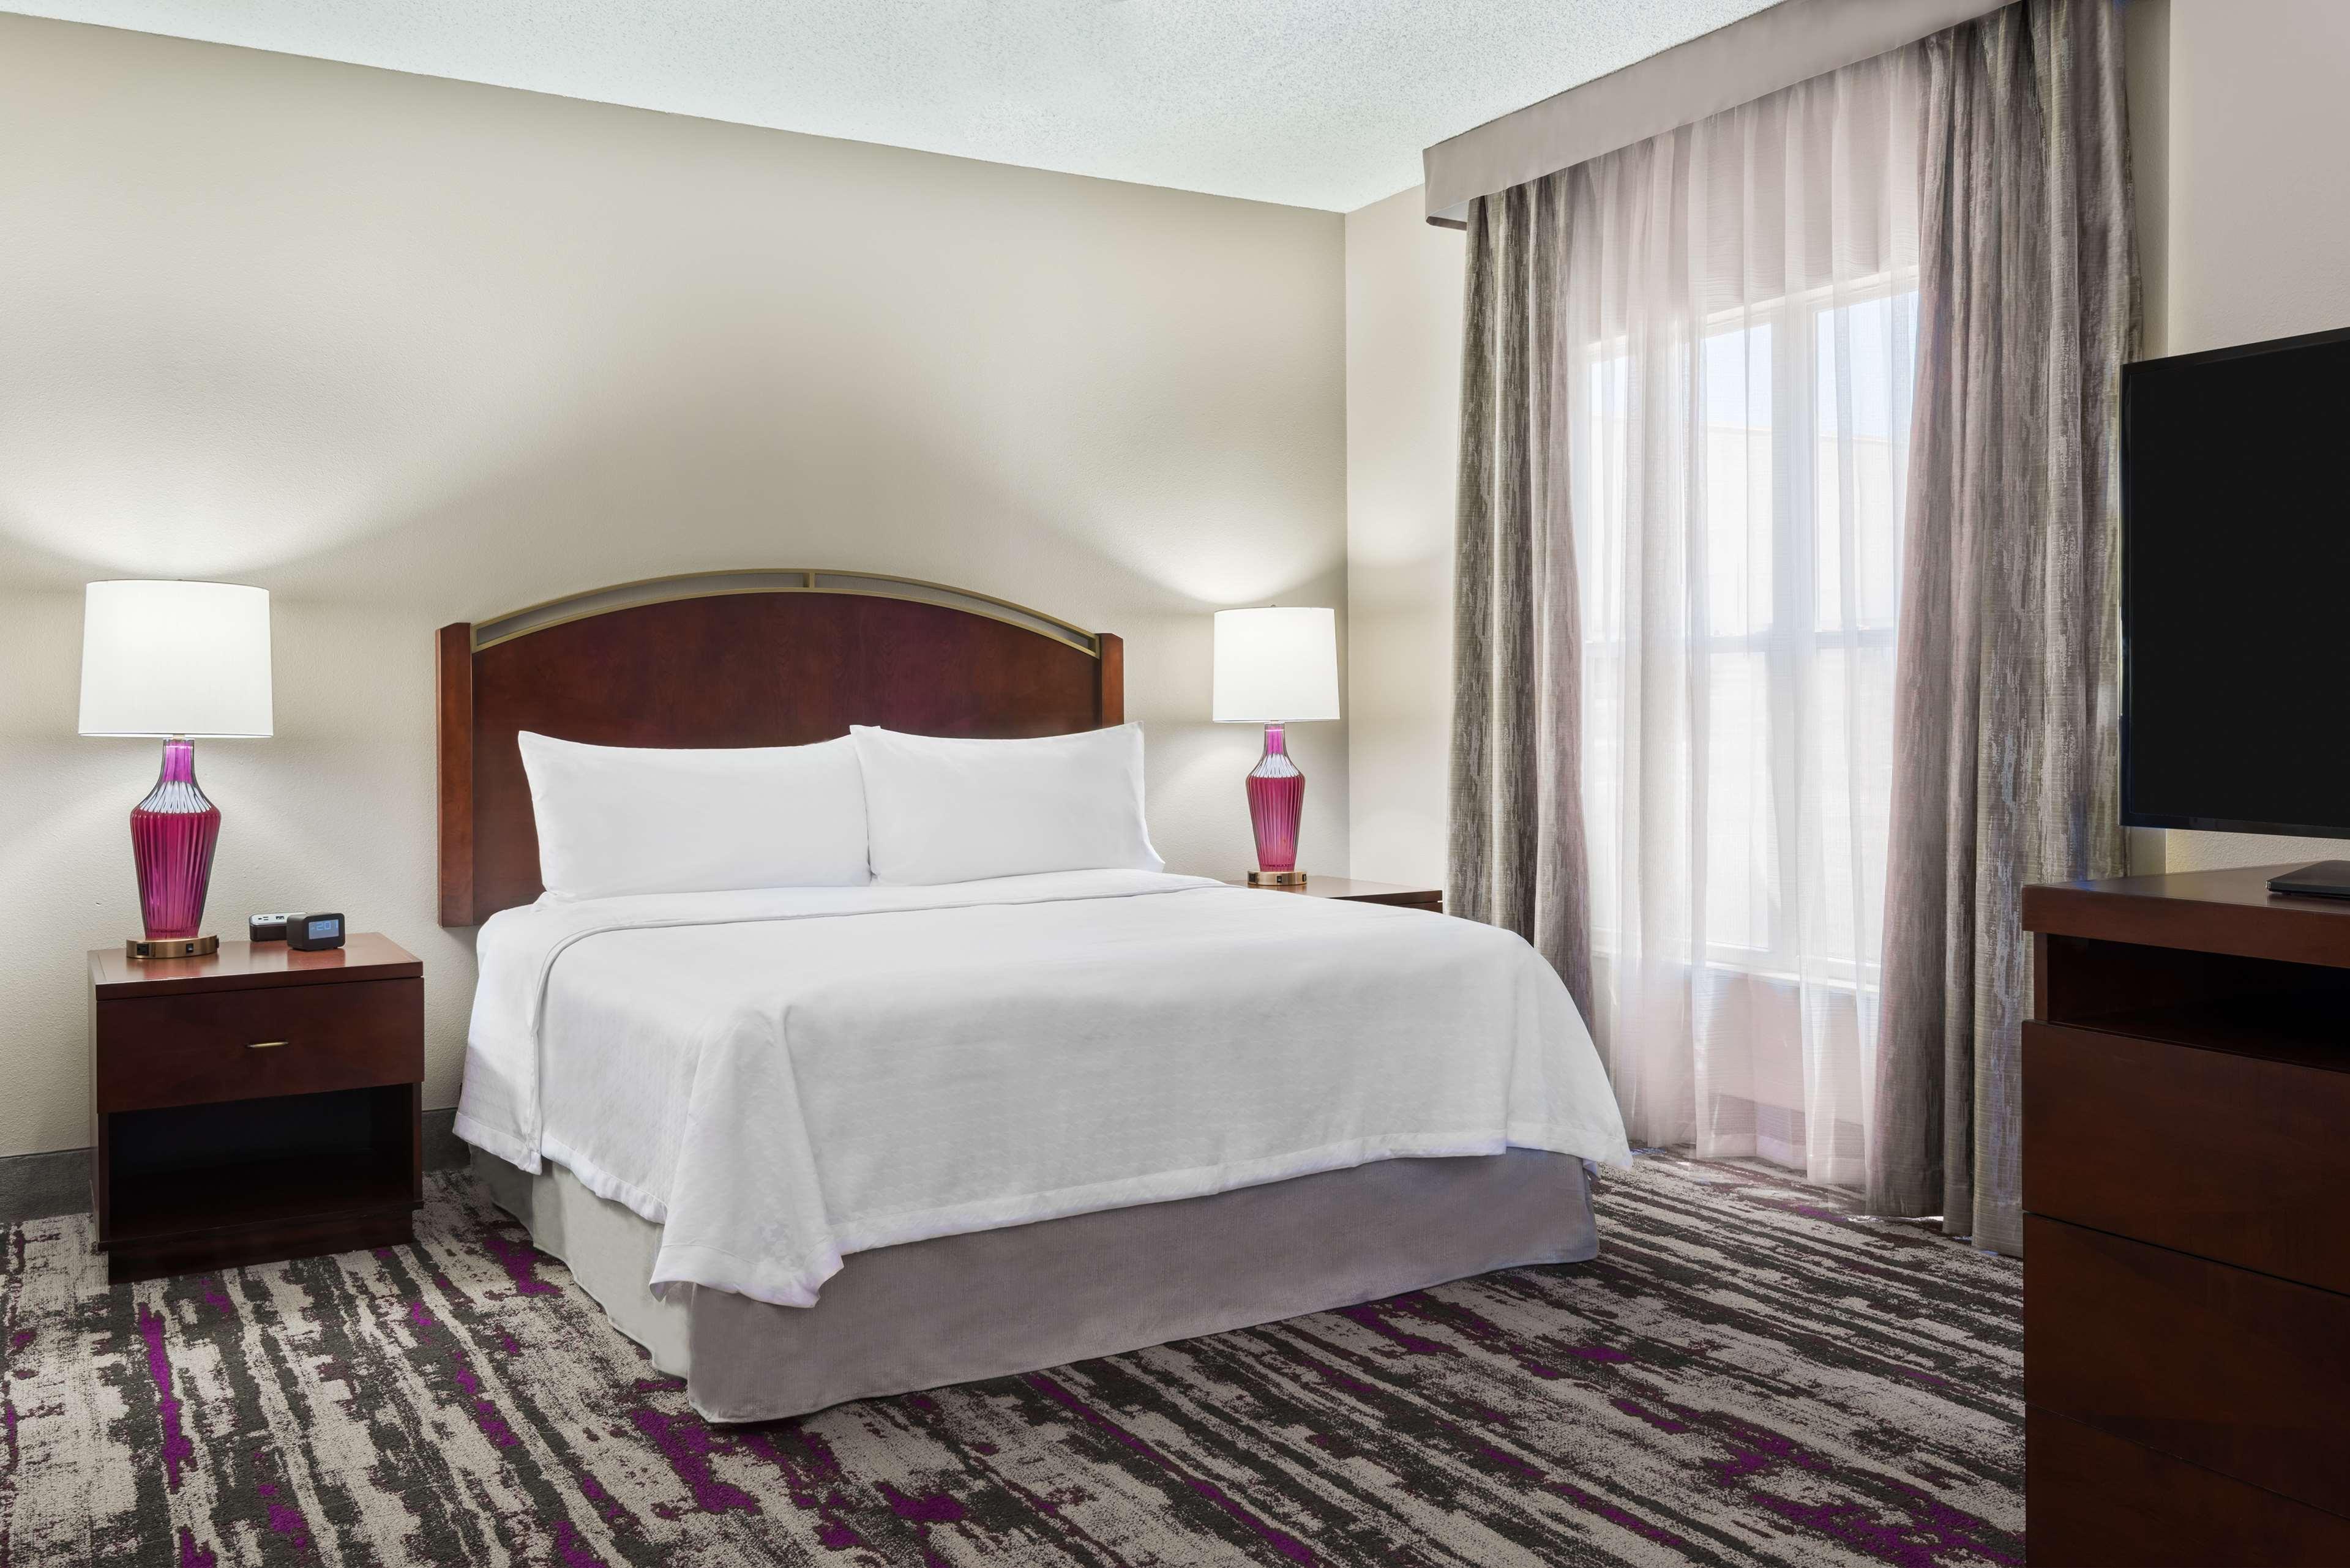 Homewood Suites by Hilton Orlando-UCF Area image 24